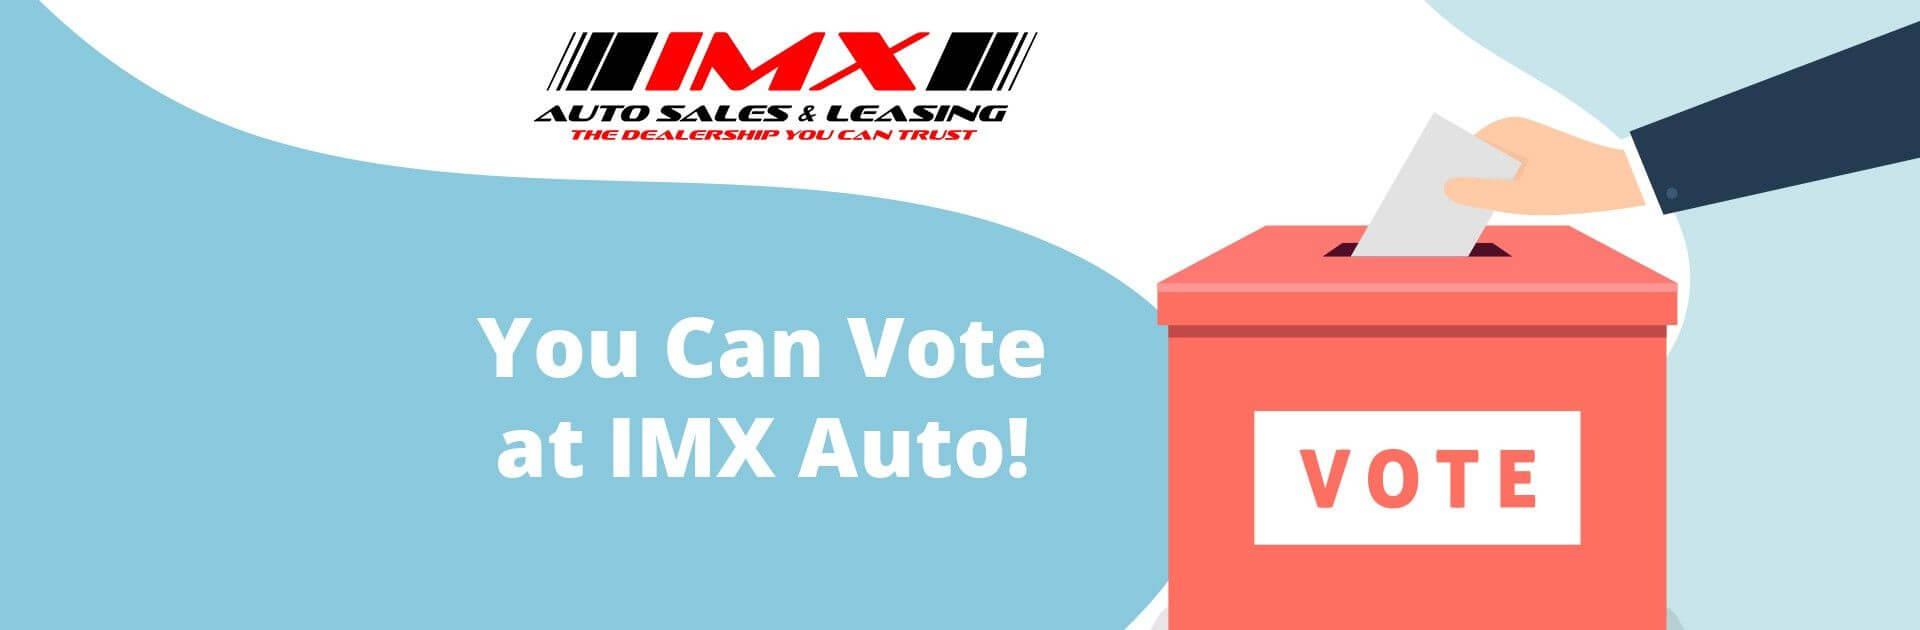 Vote at IMX